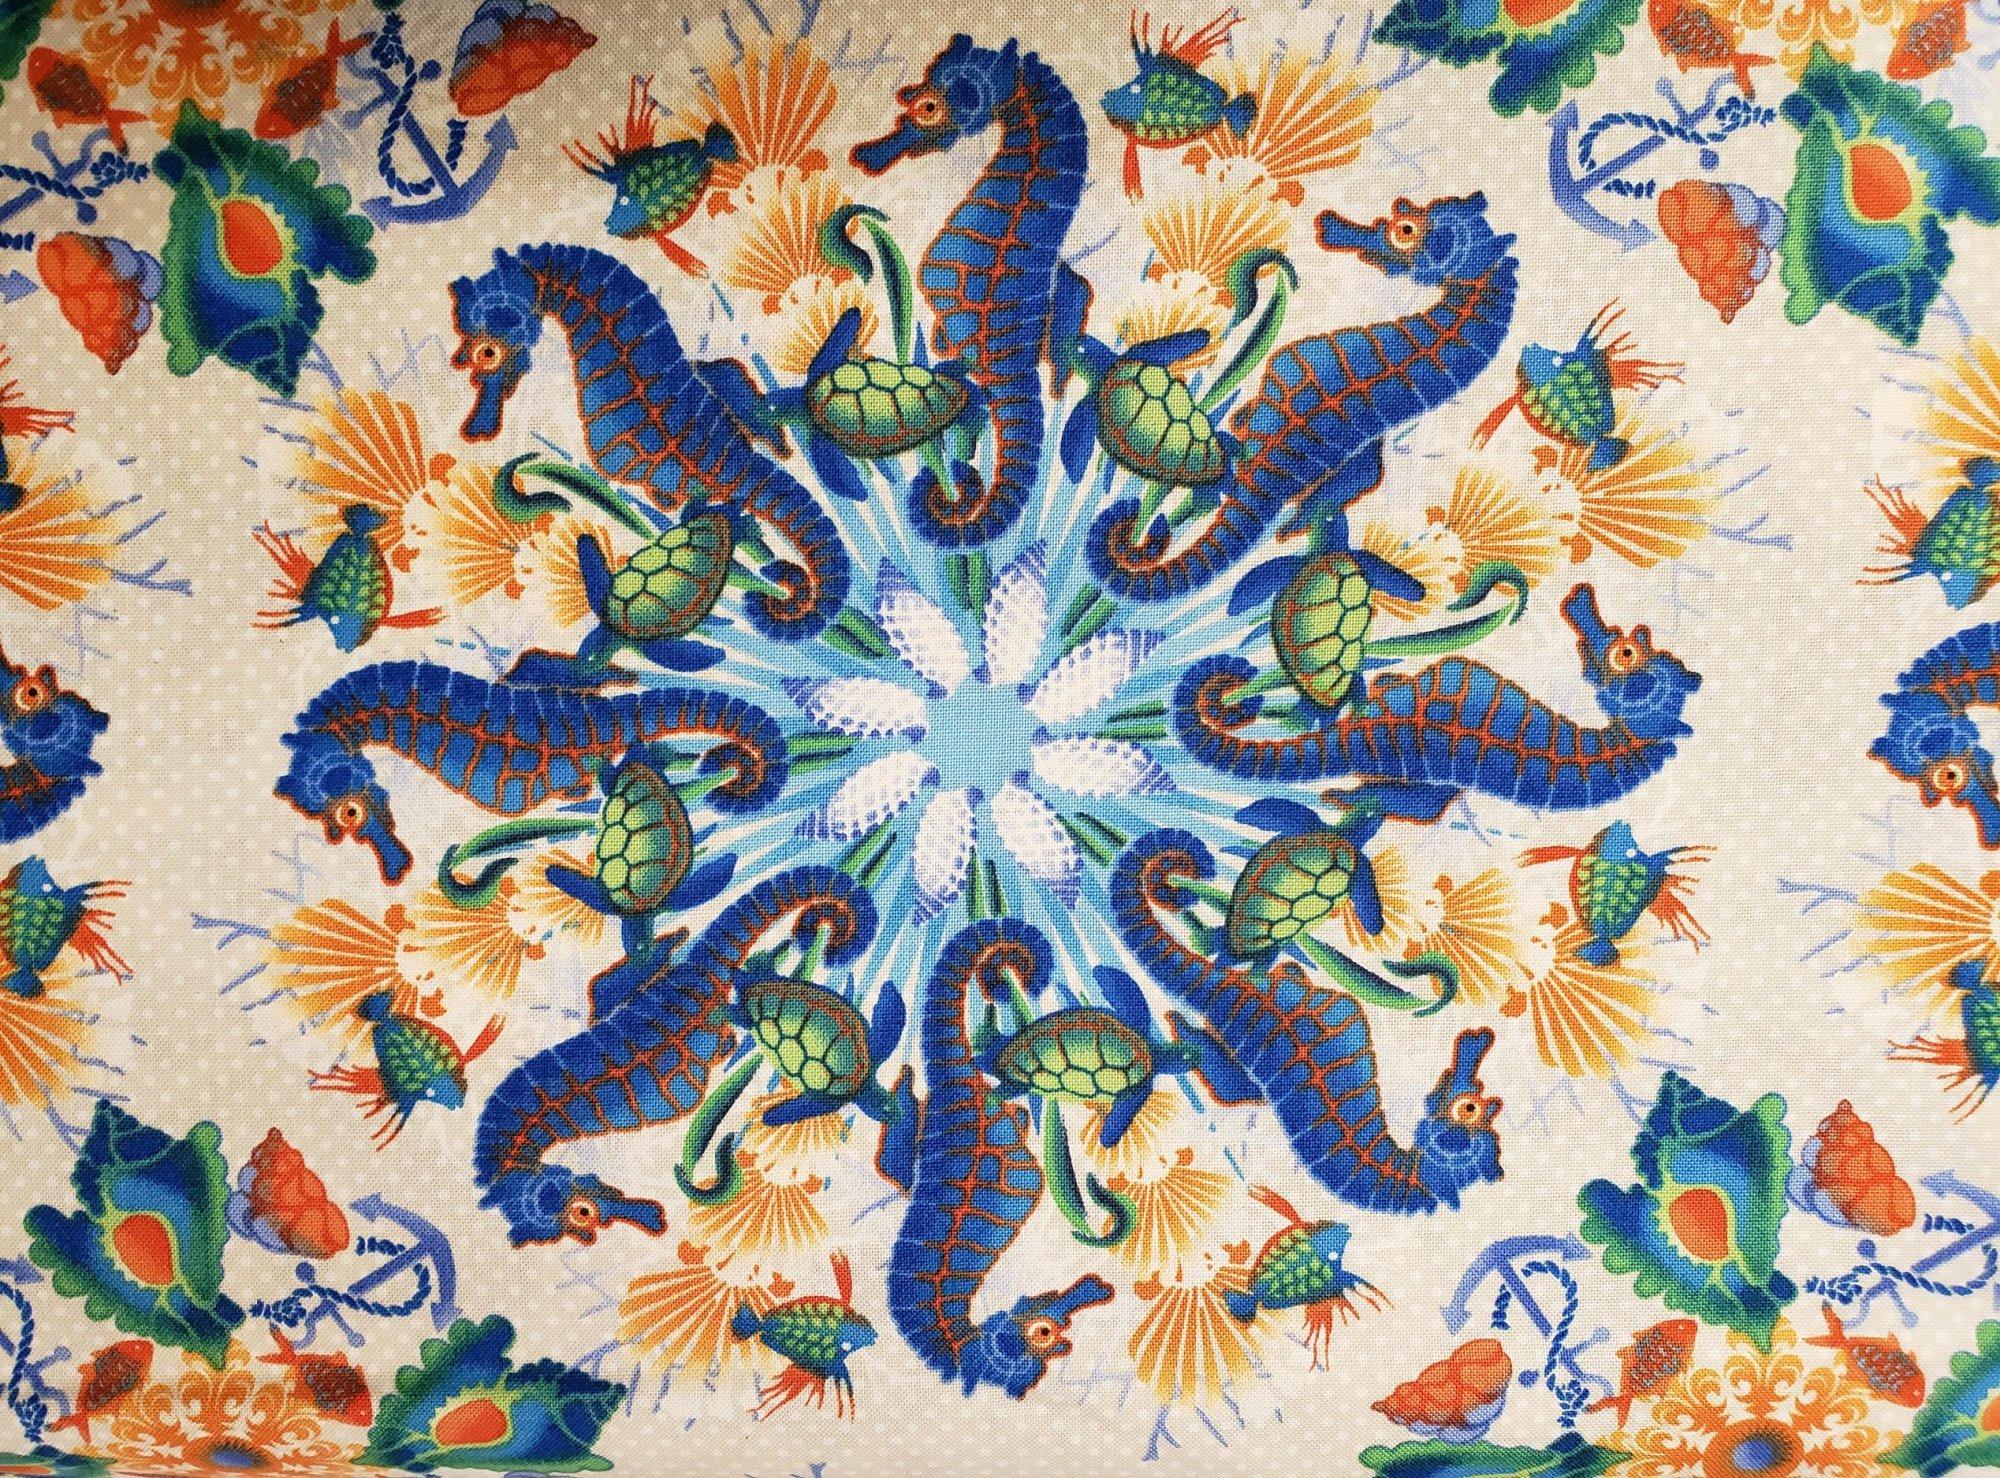 Seahorse Kaleidoscope